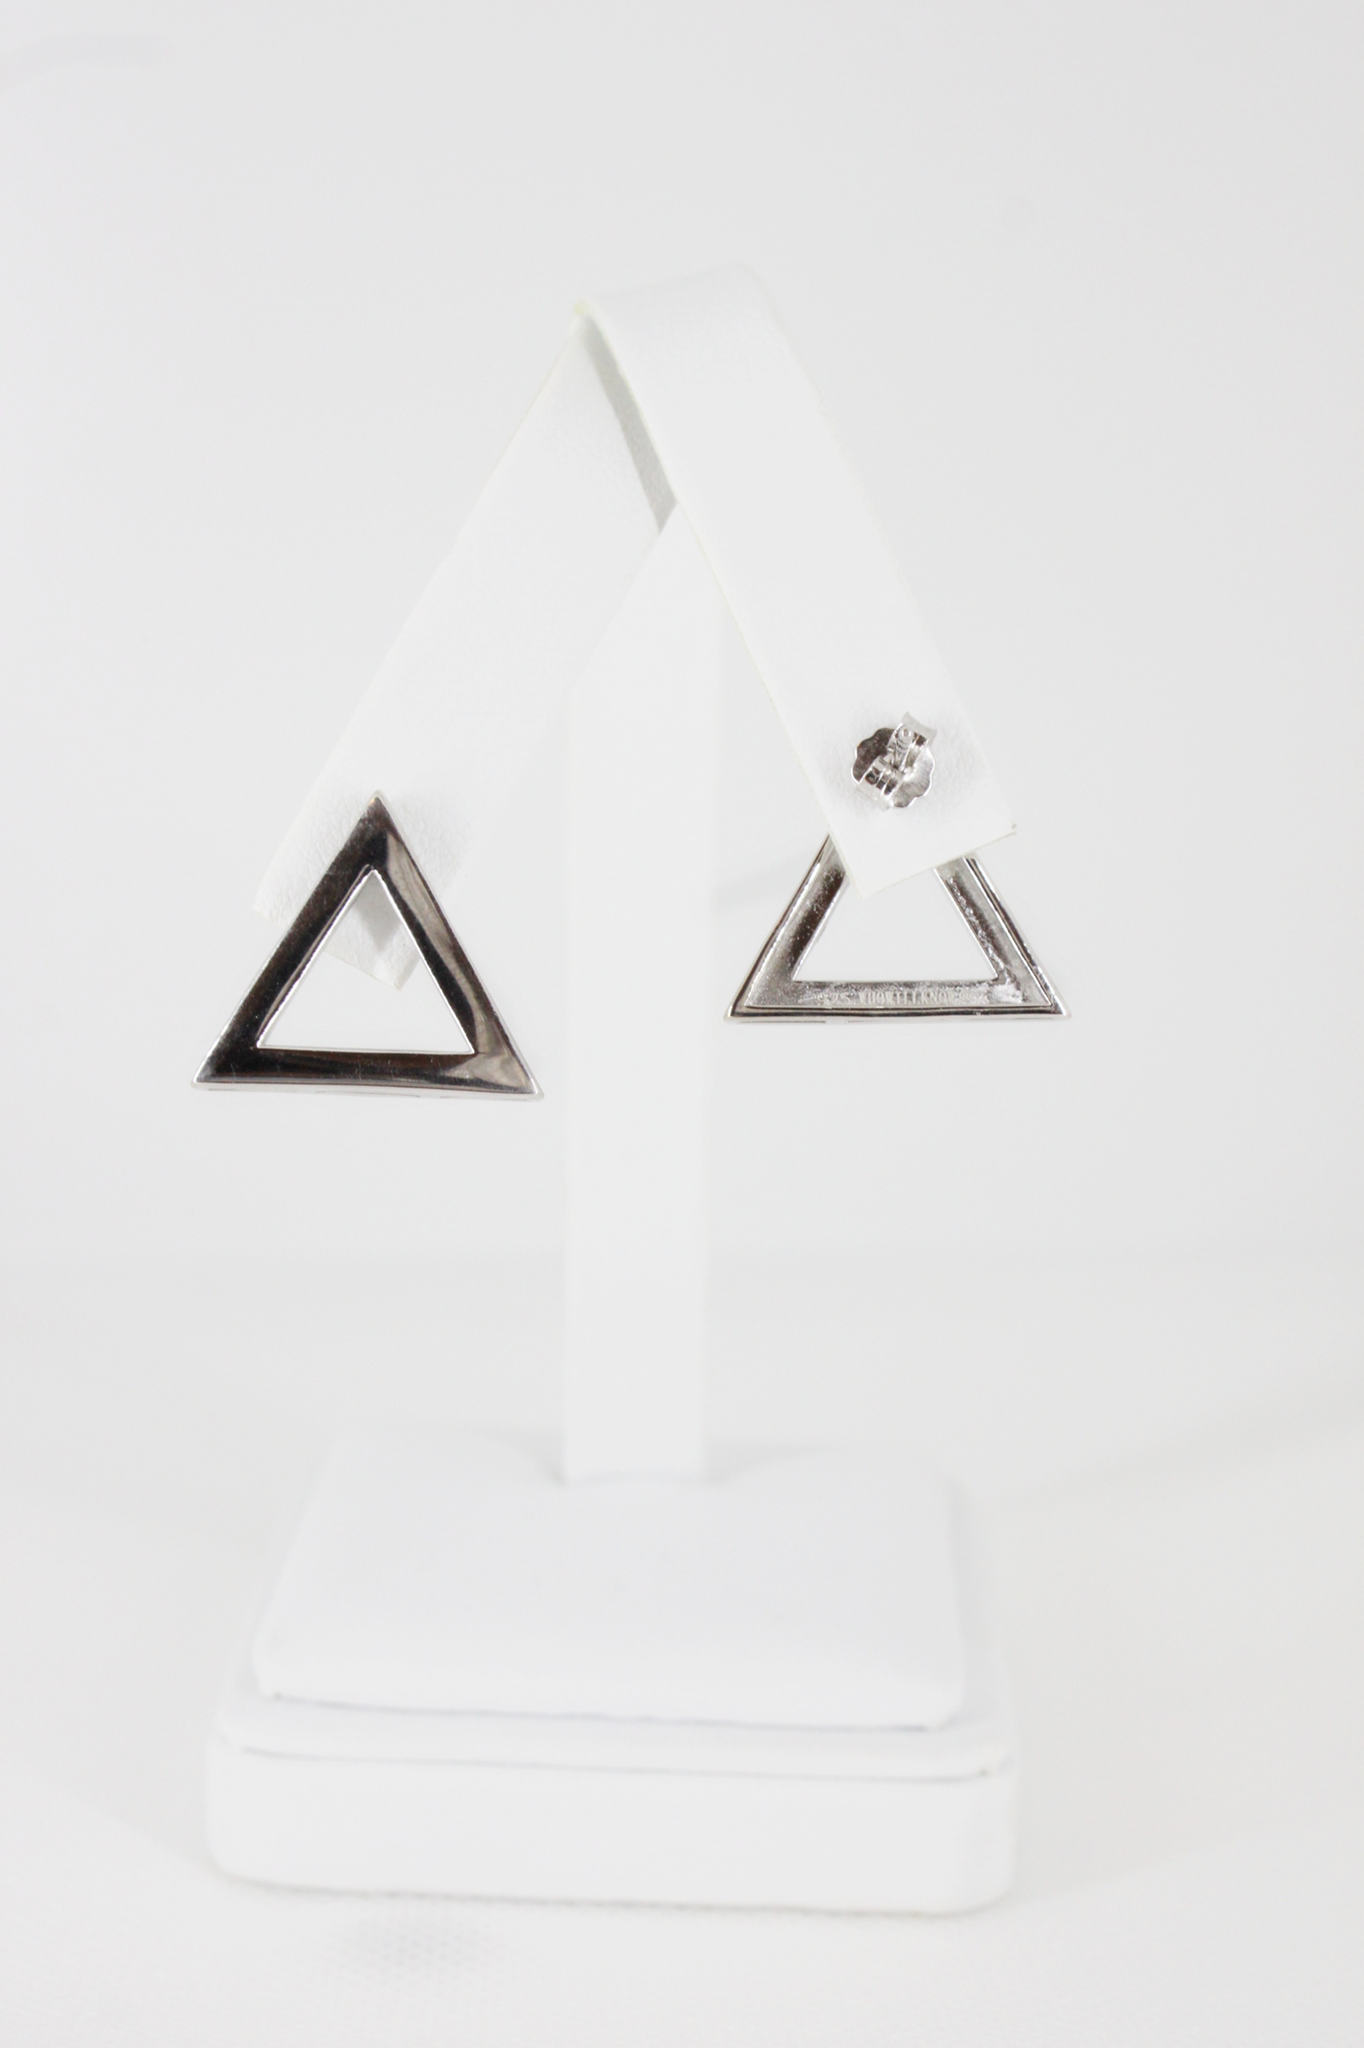 Sterling Plain 925 Pyramid Earrings 00144